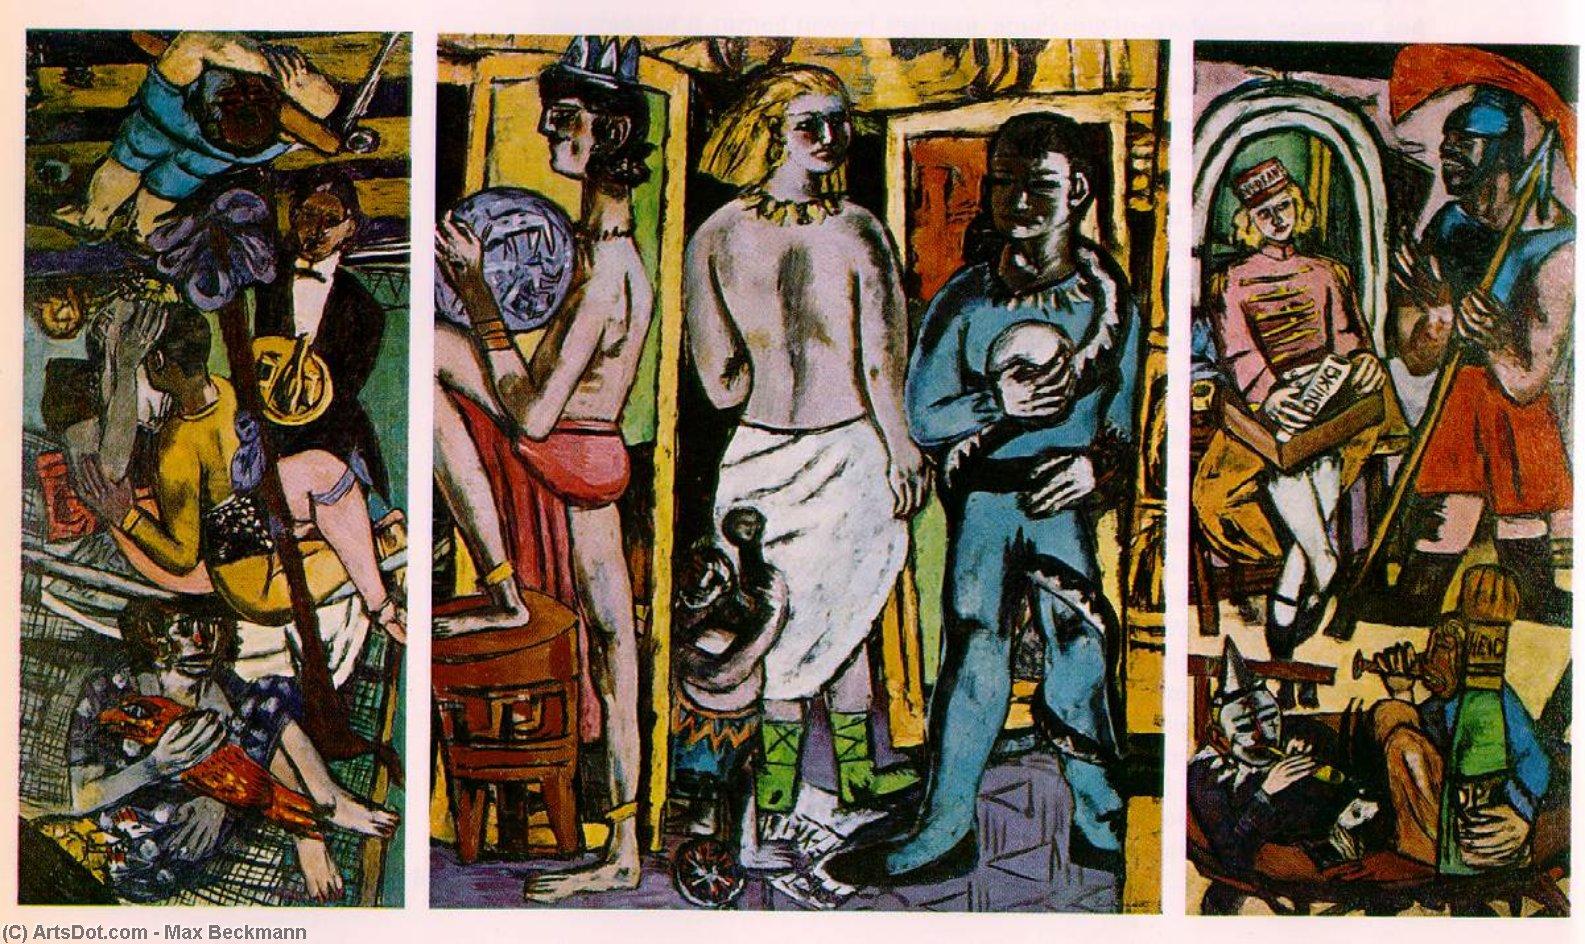 representational art visual arts encyclopedia - HD1585×944